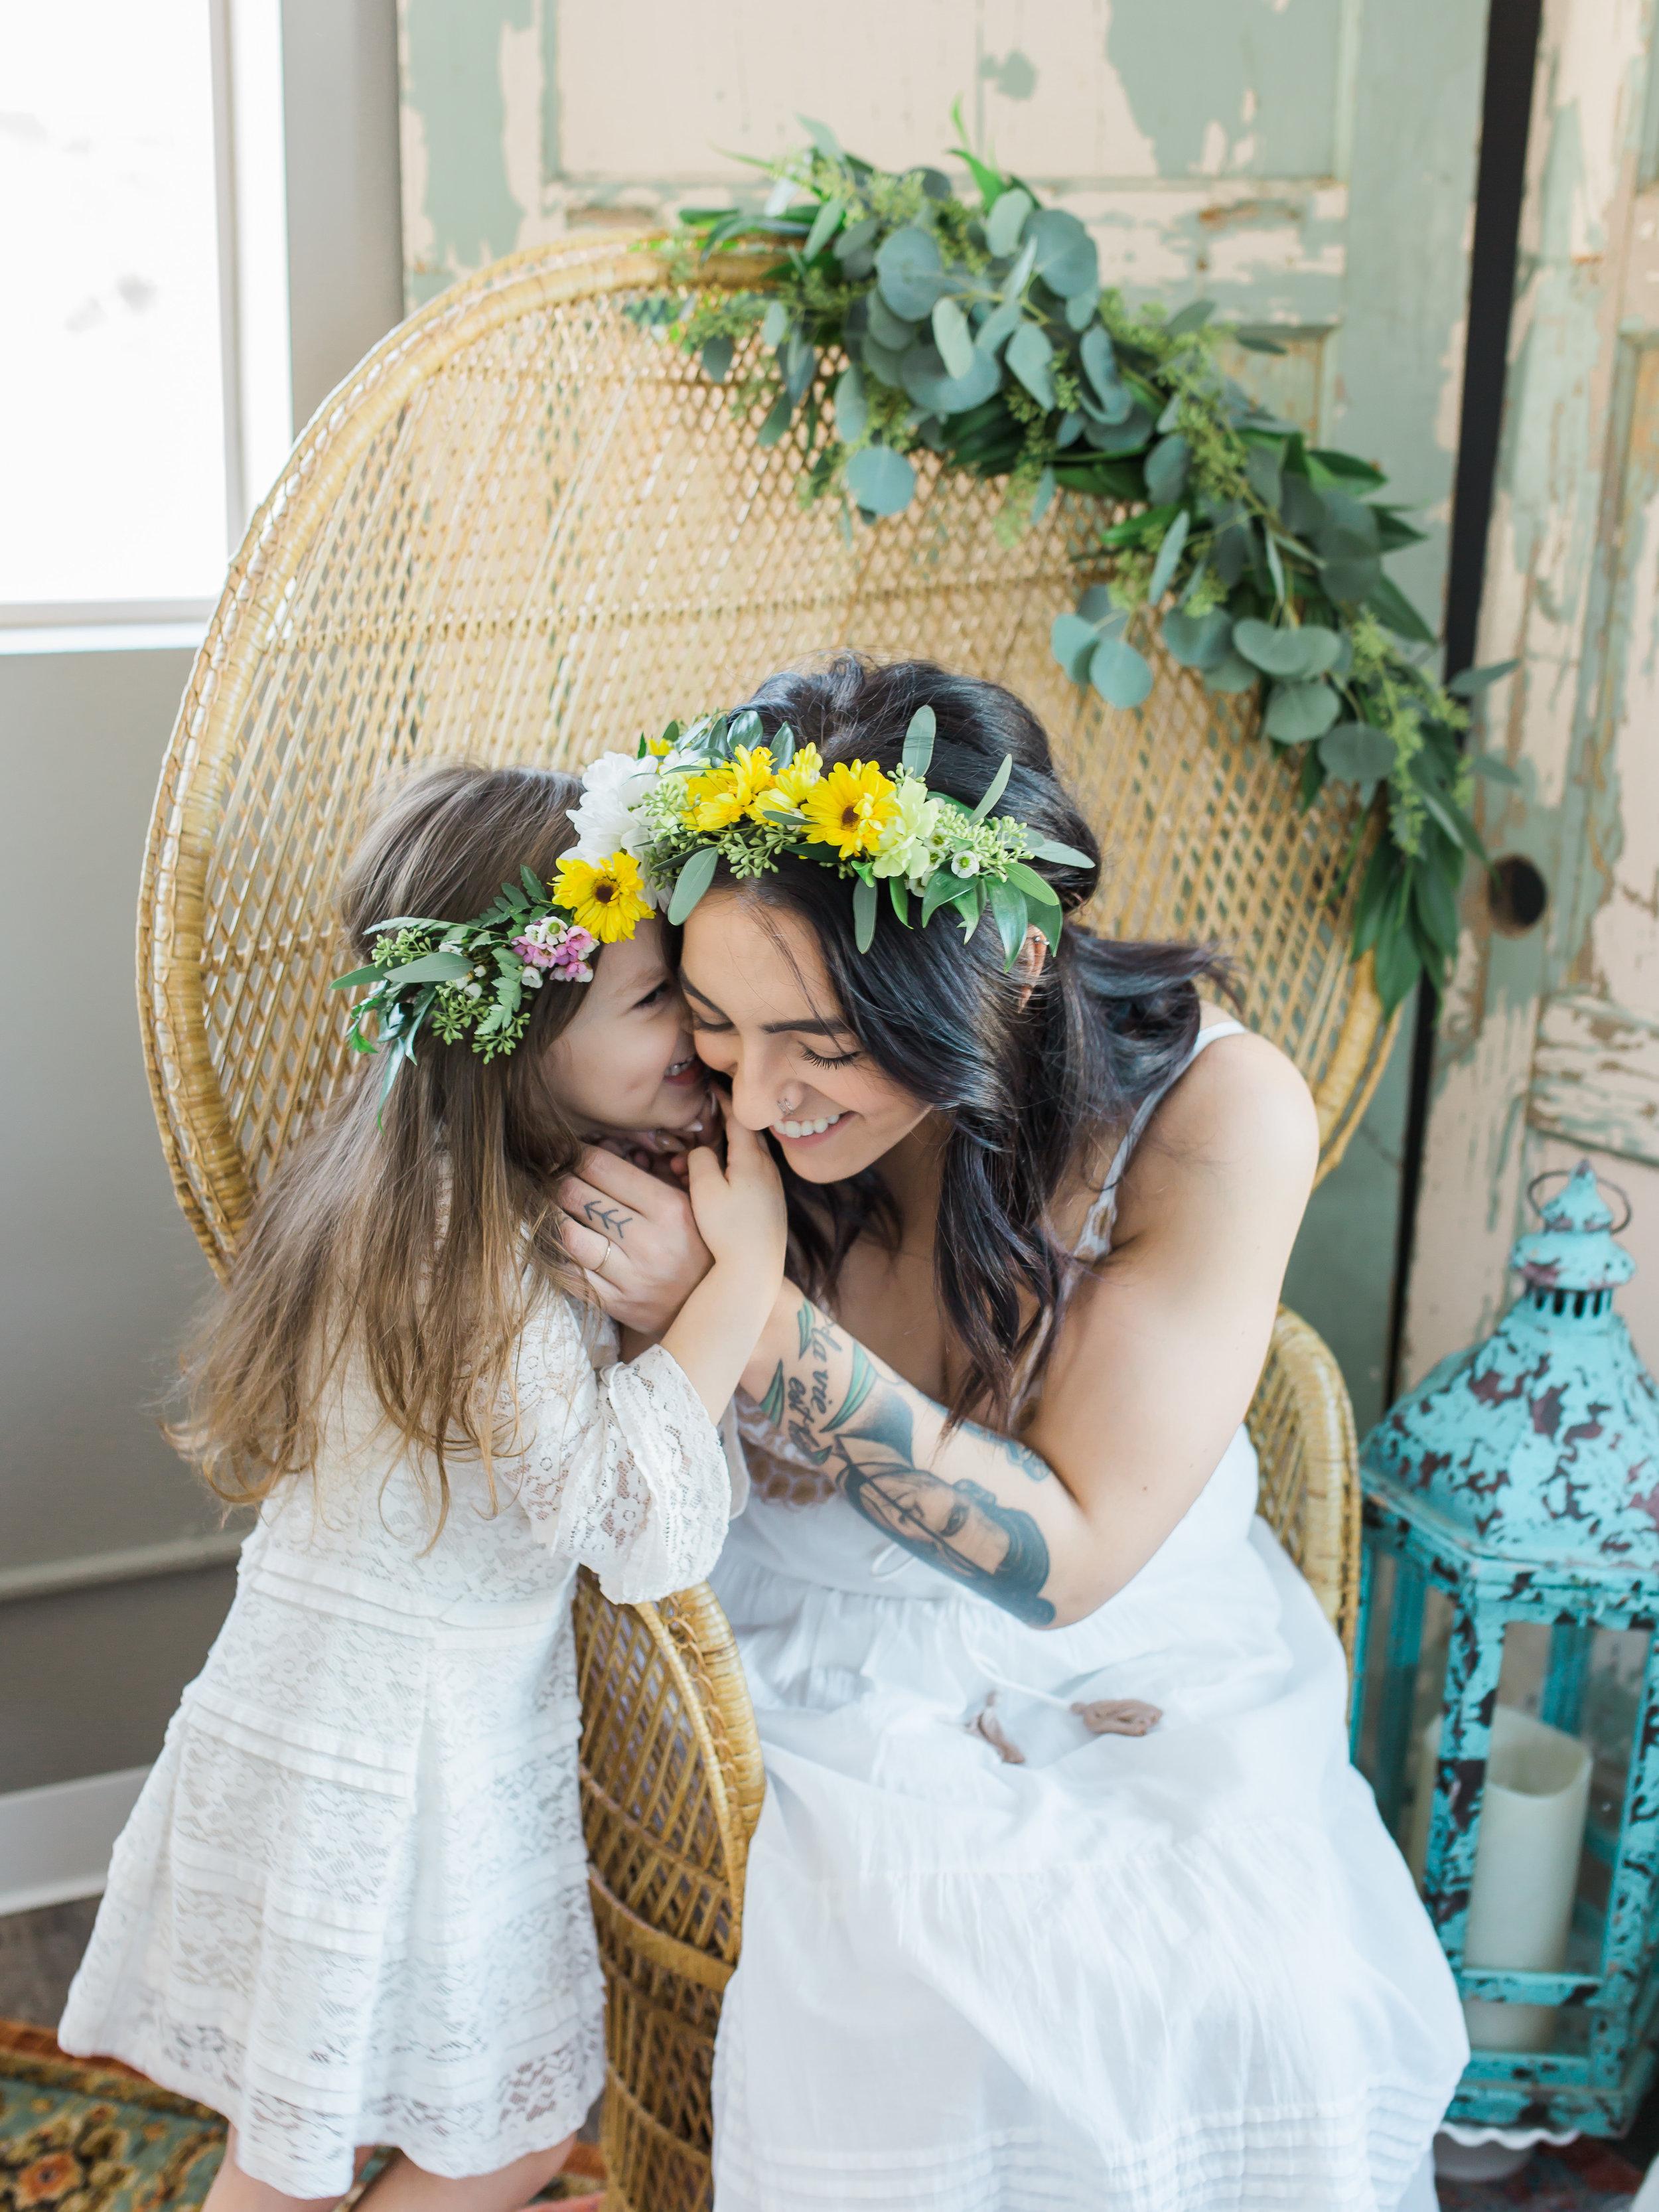 Mother&DaughterEvent-4.jpg